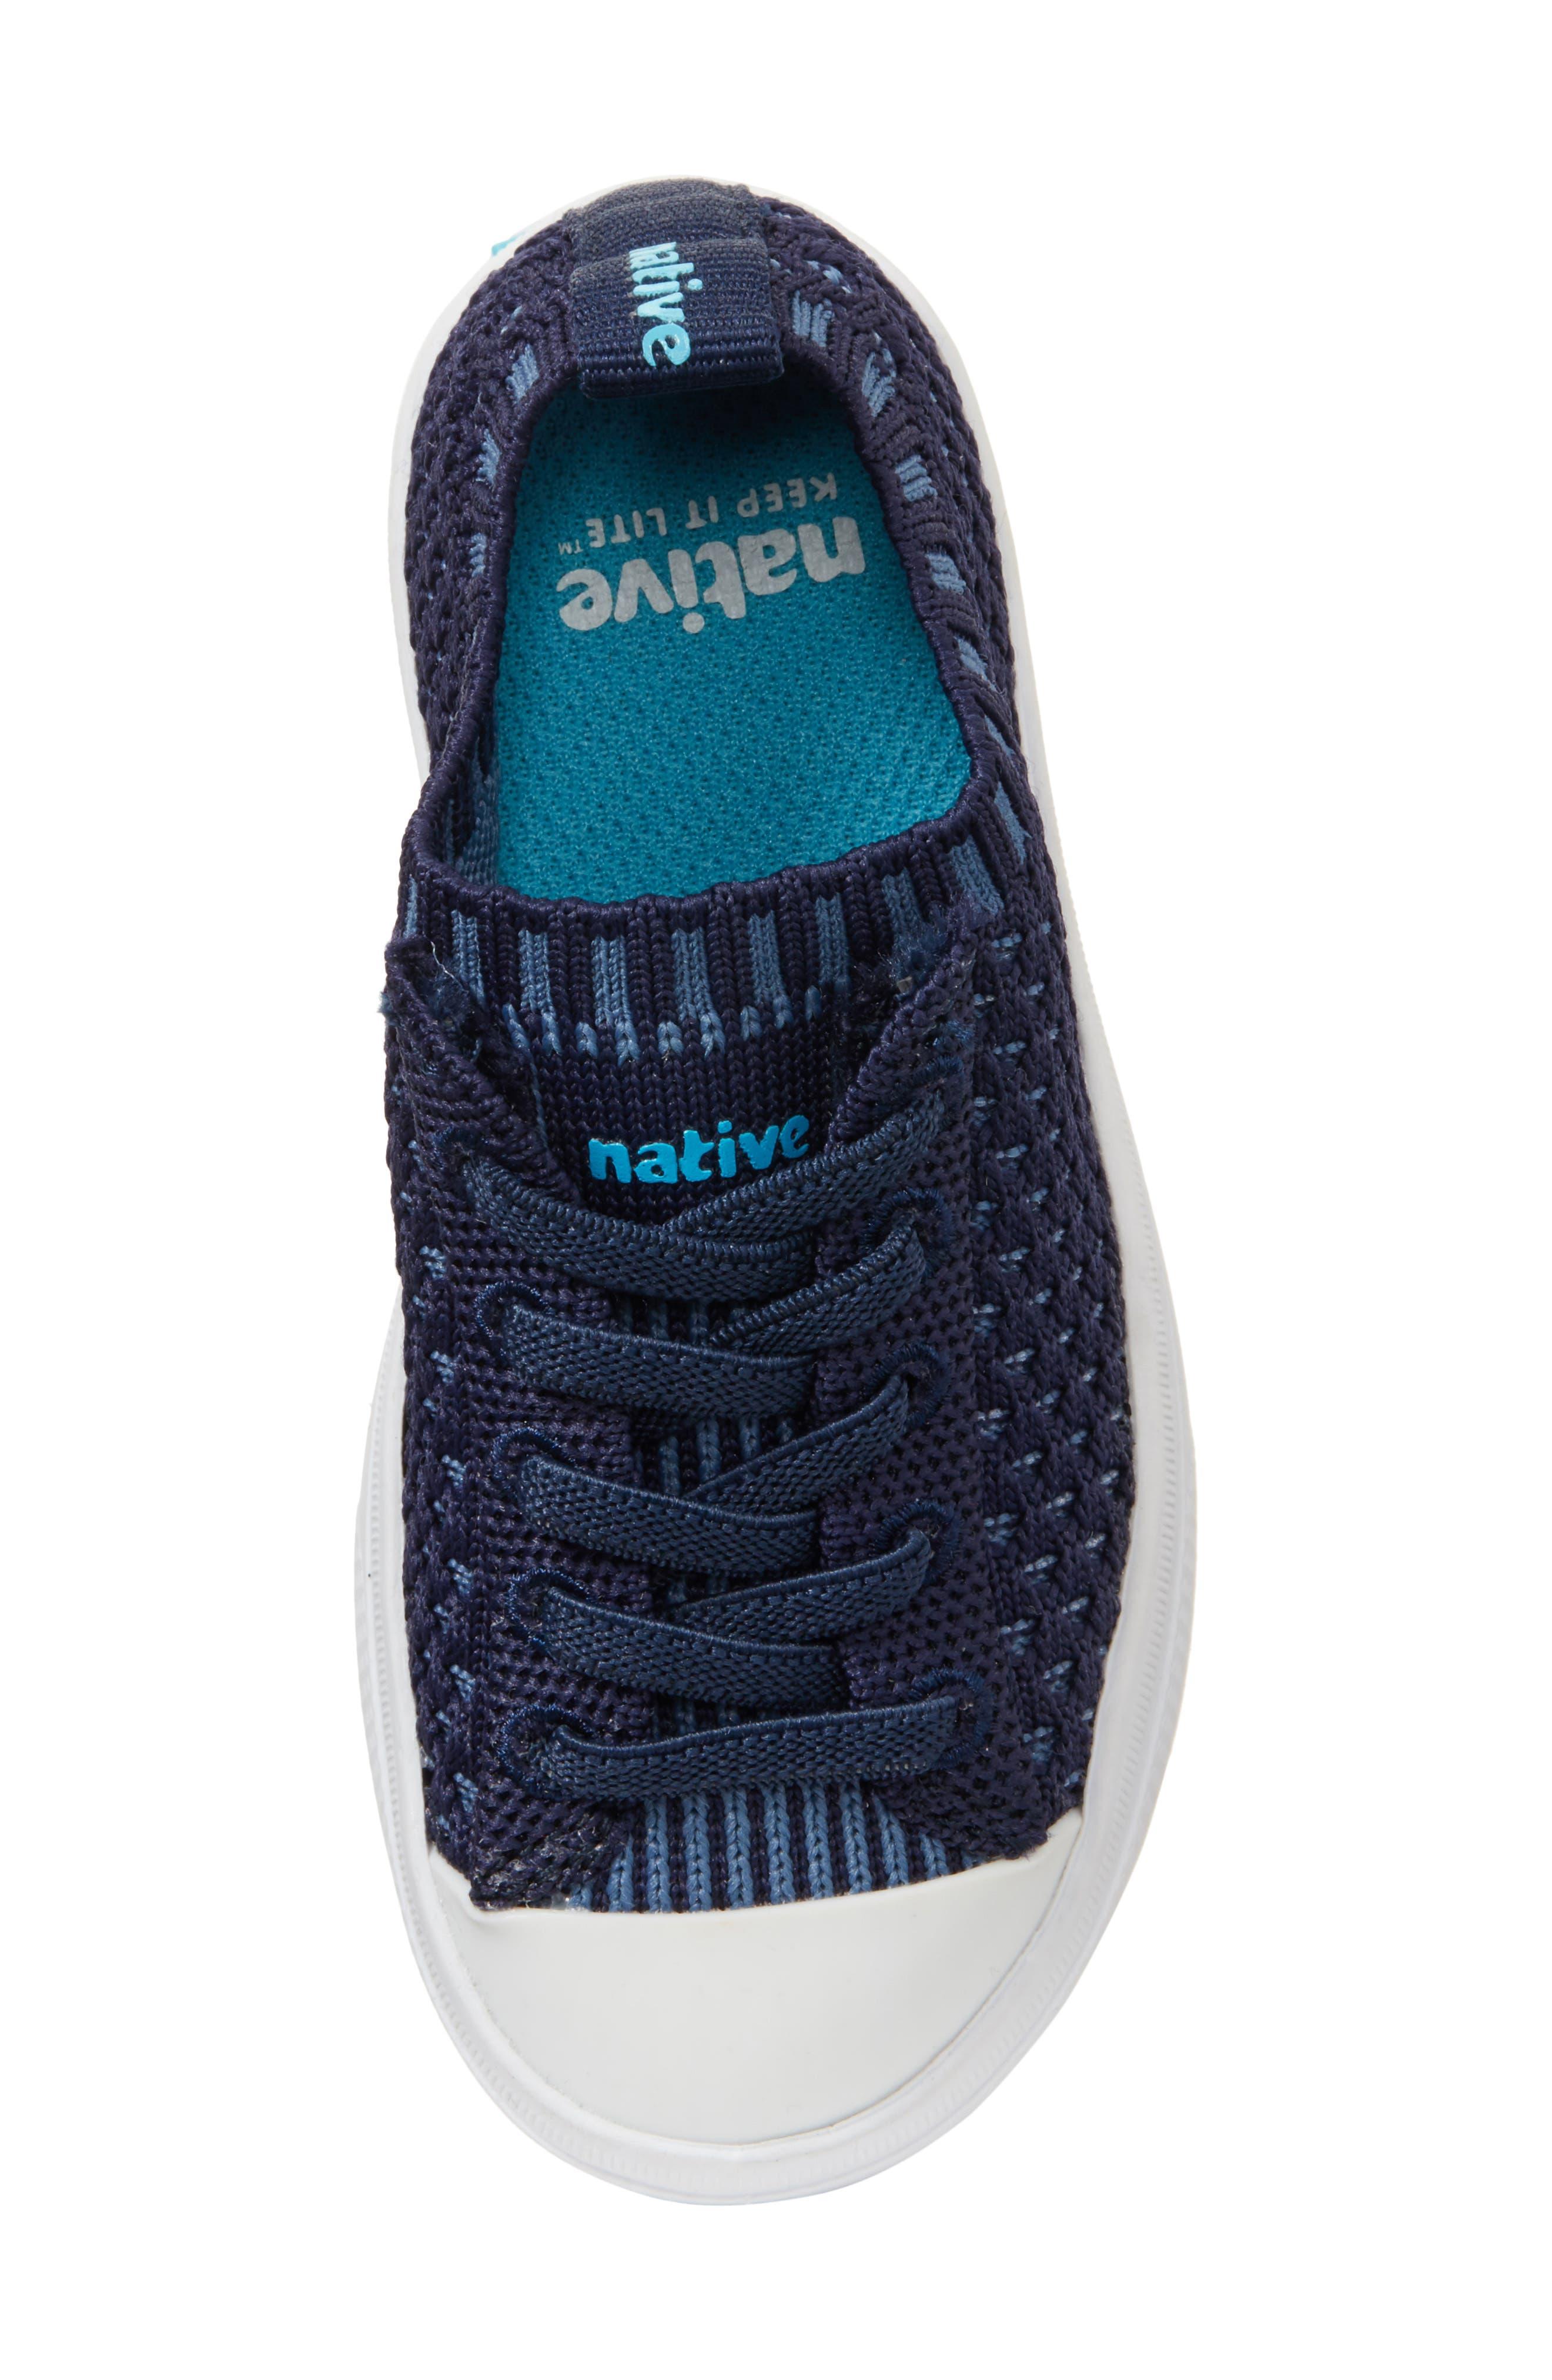 Native Jefferson 2.0 LiteKnit Sneaker,                             Alternate thumbnail 5, color,                             REGATTA BLUE/ SHELL WHITE